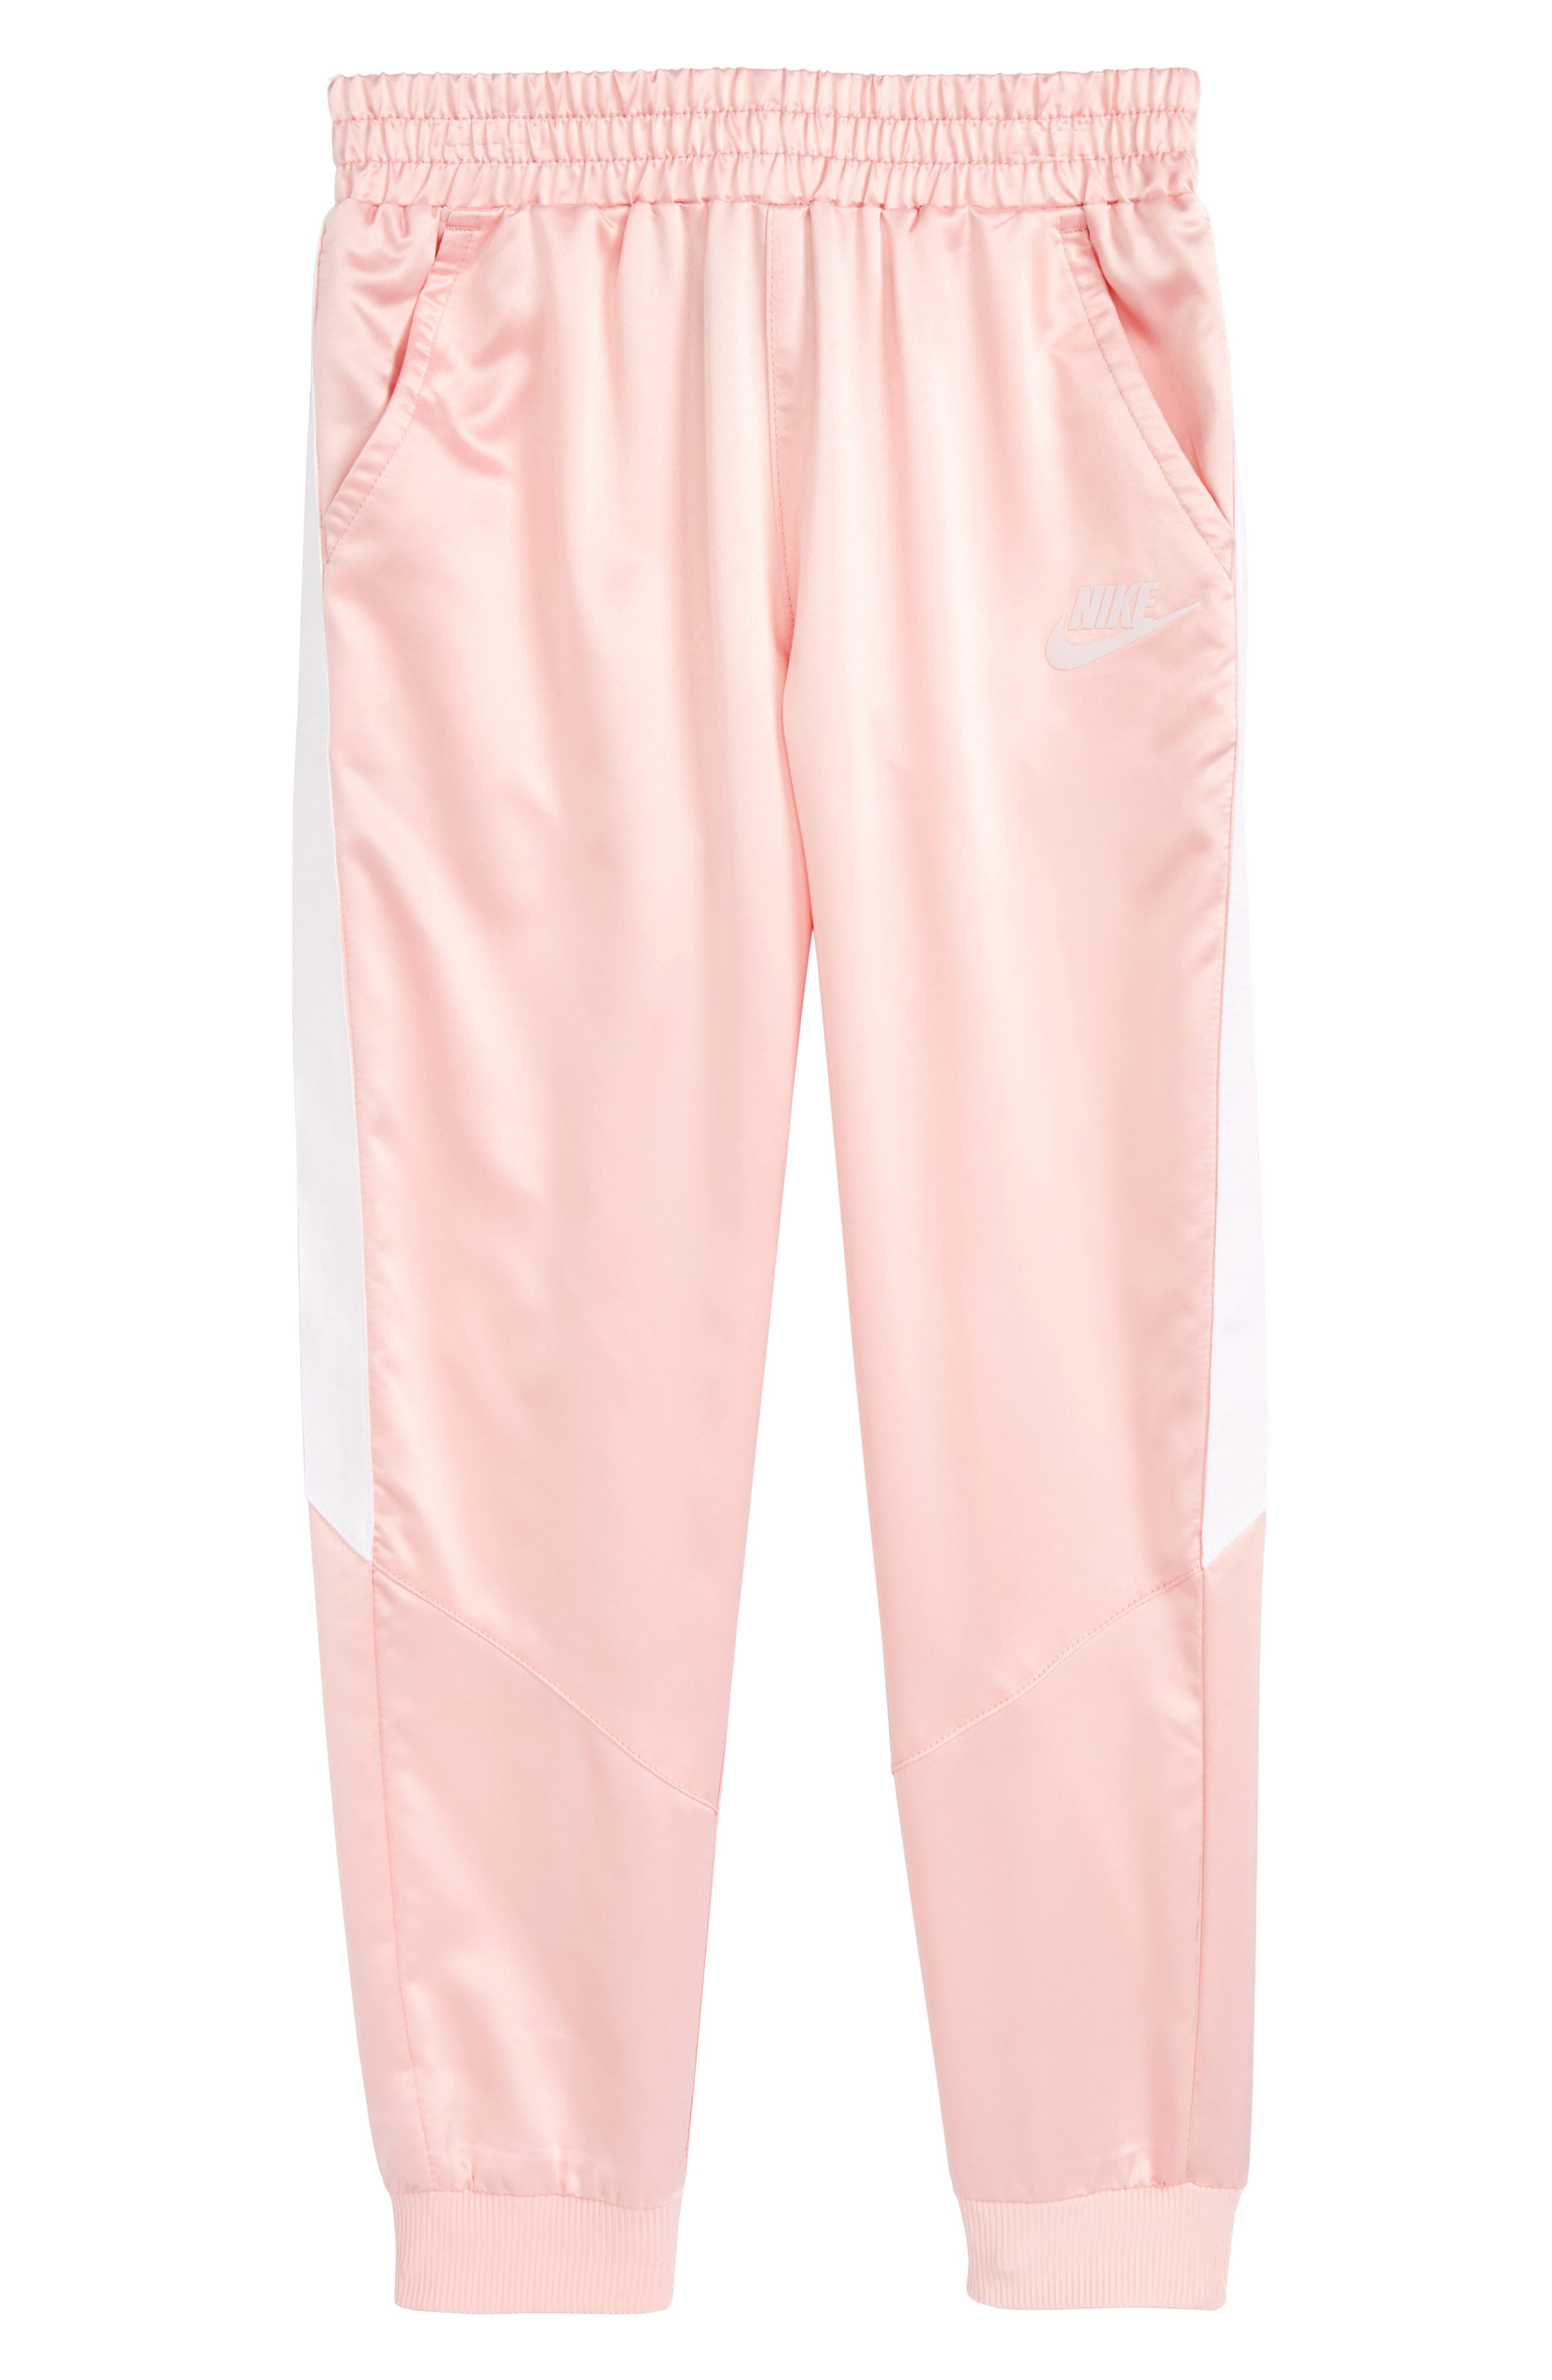 Satin Jogger Pants,                         Main,                         color, Bleached Coral